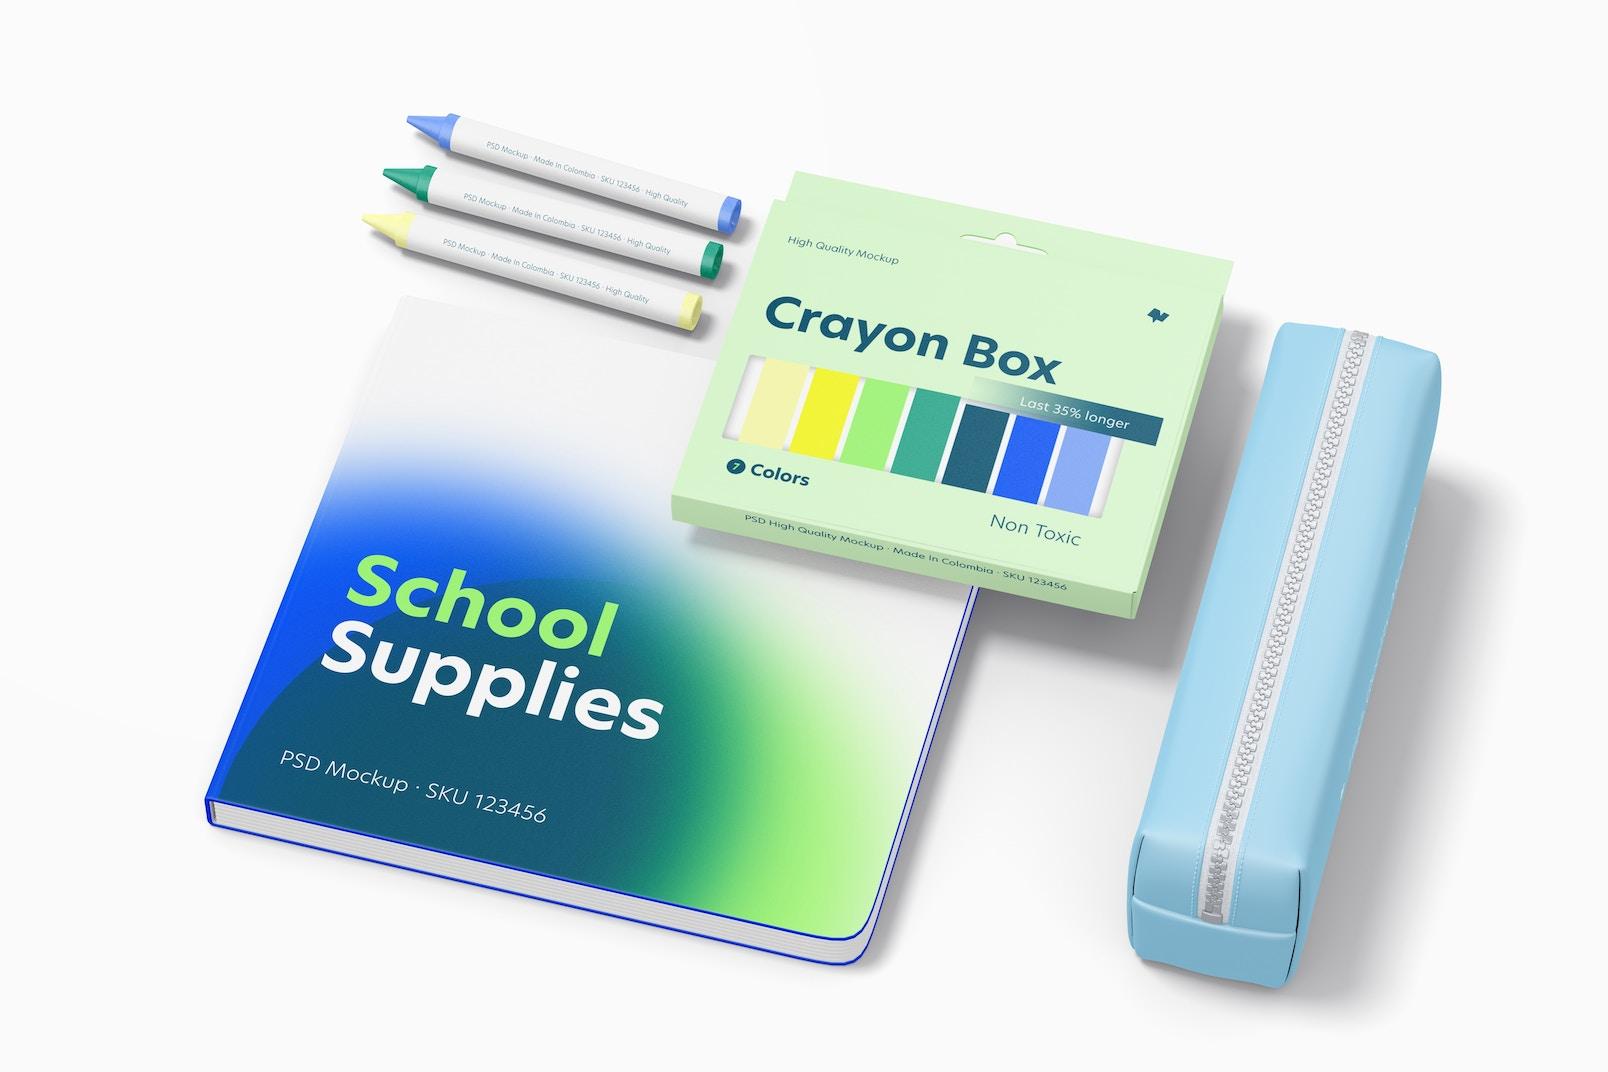 School Supplies Mockup, Floating